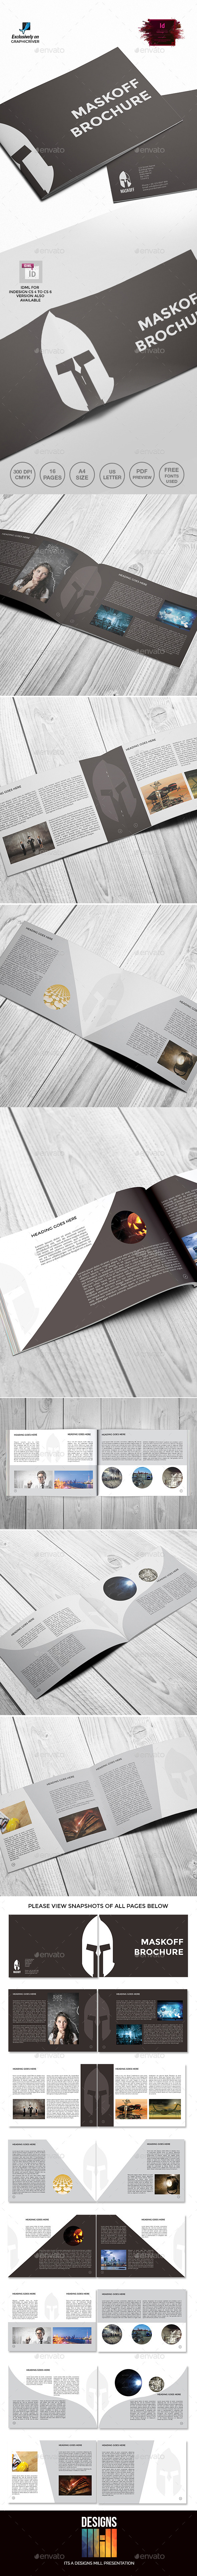 GraphicRiver Maskoff Landscape Brochure Template 9516649